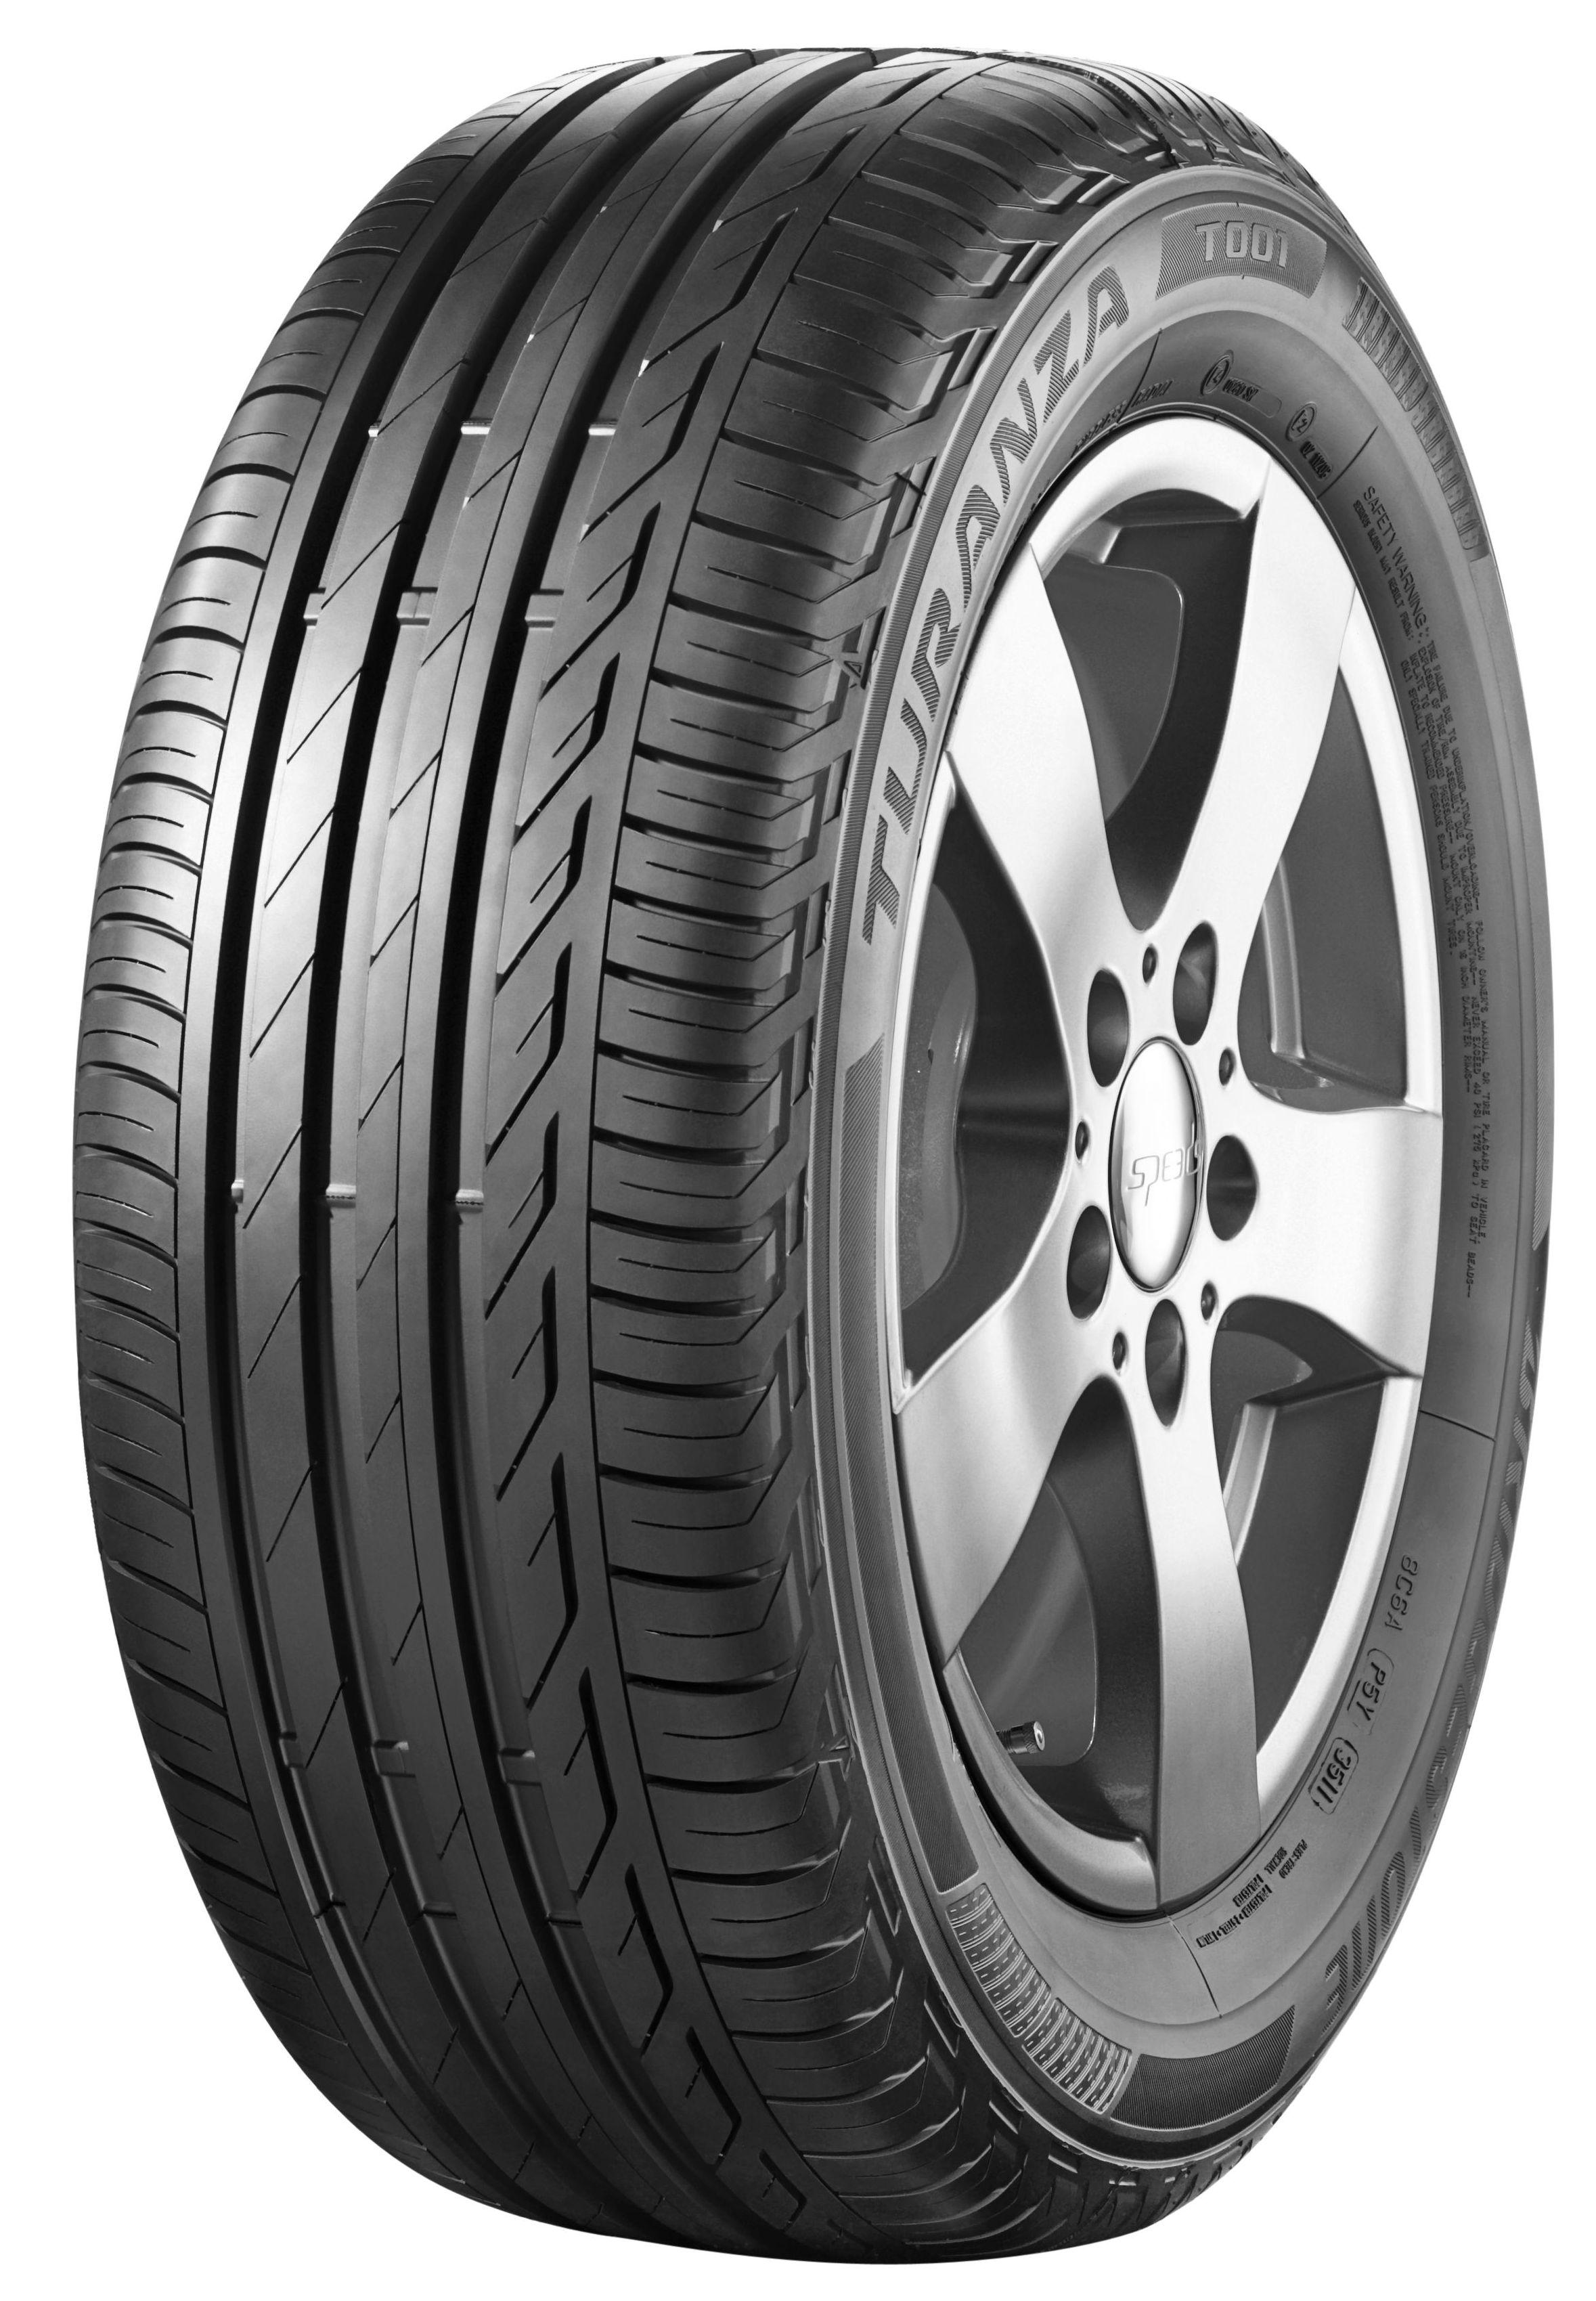 автомобильные шины Bridgestone Turanza T001 Evo 235/55 R17 99W